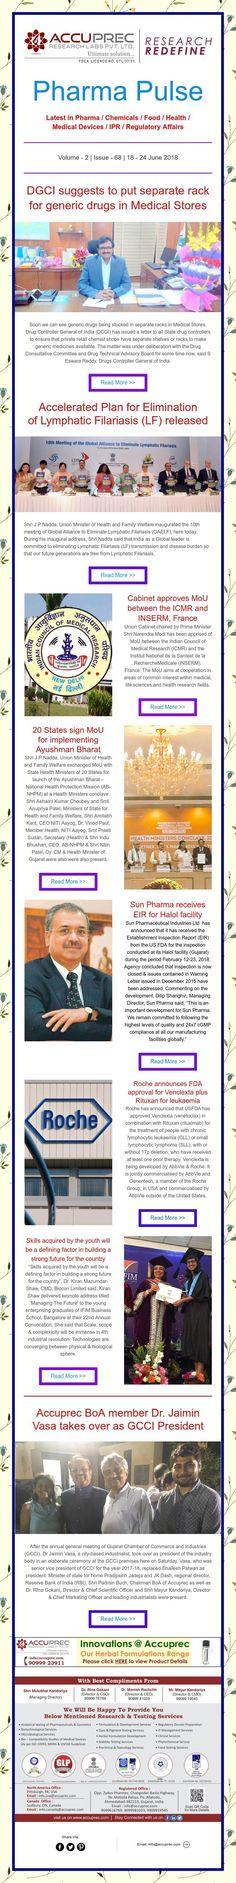 Pharma Pulse issue 68